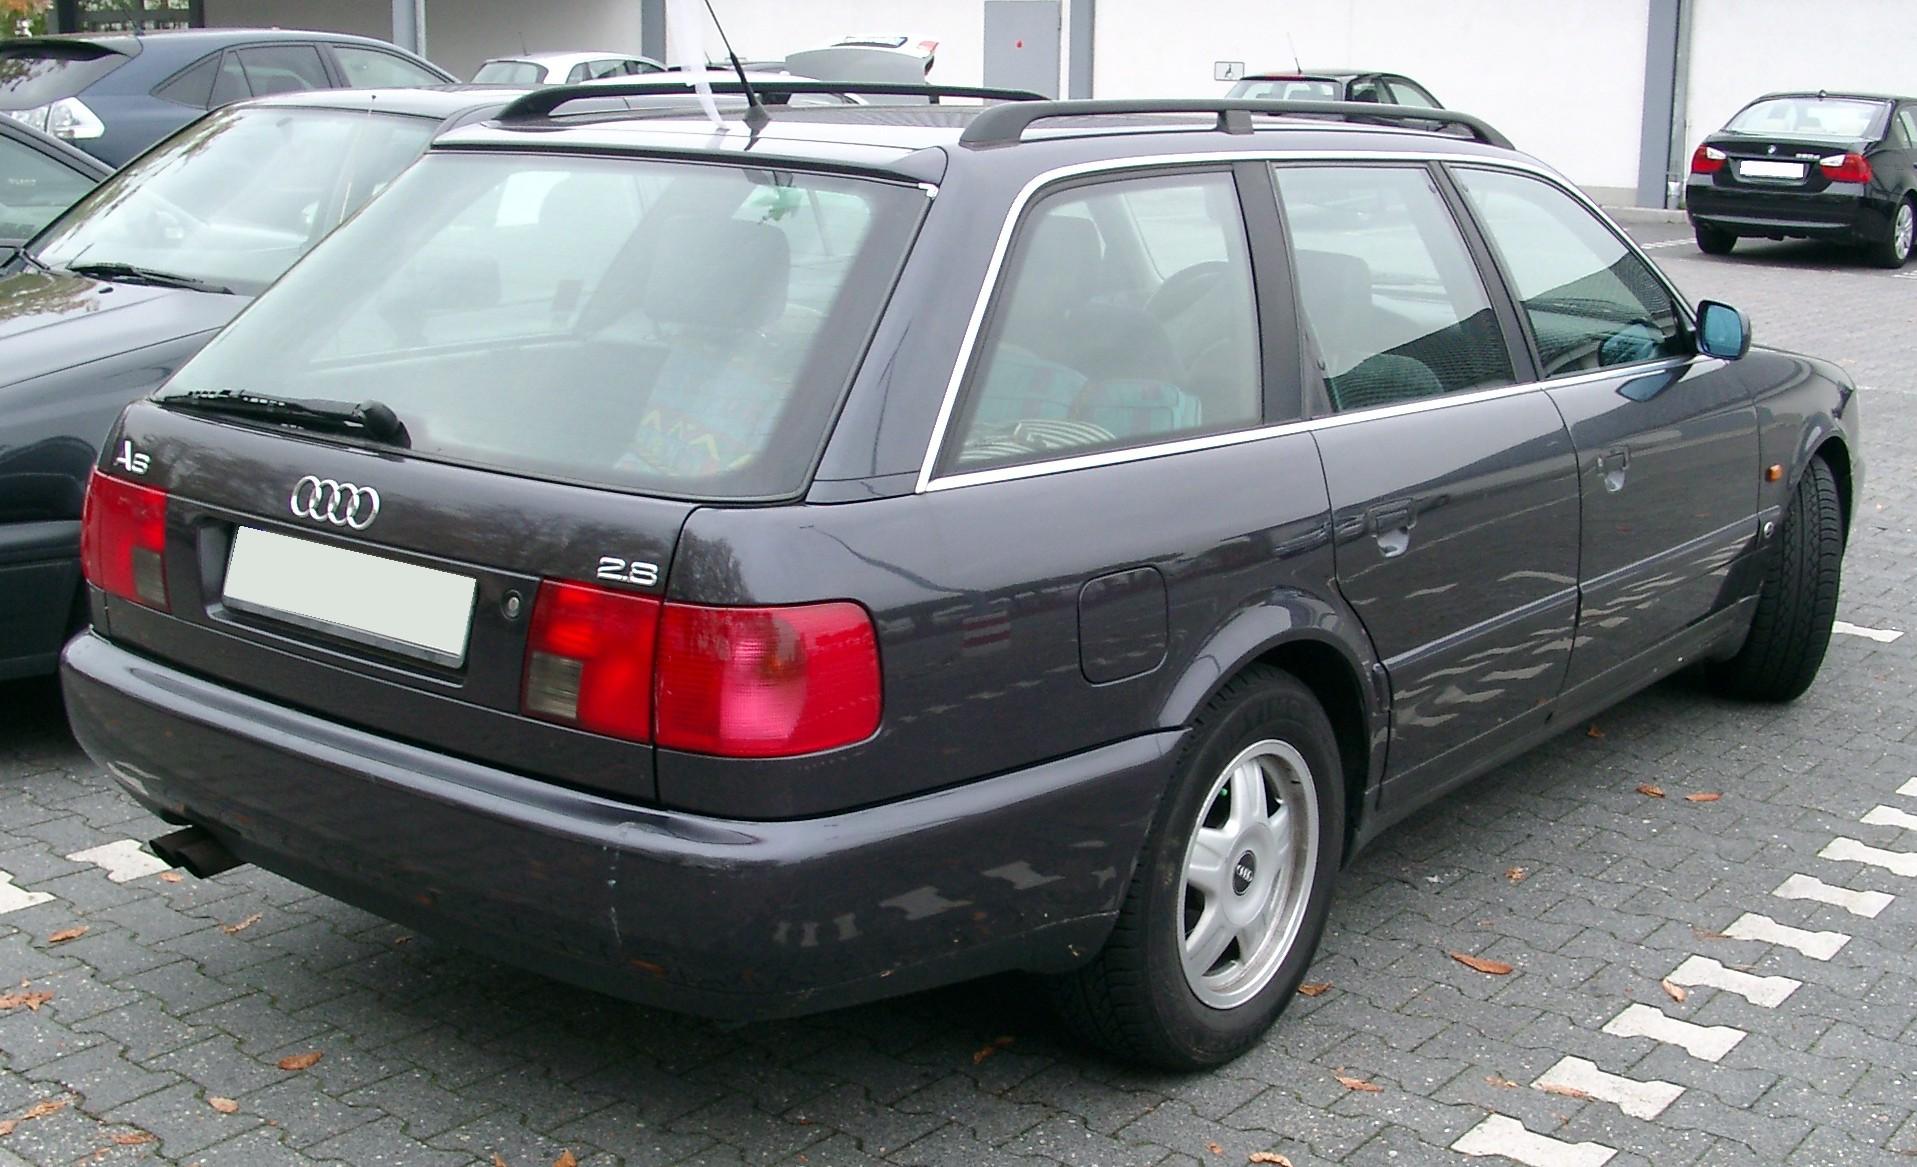 Archivo:Audi A6 C4 Avant rear 20071002.jpg